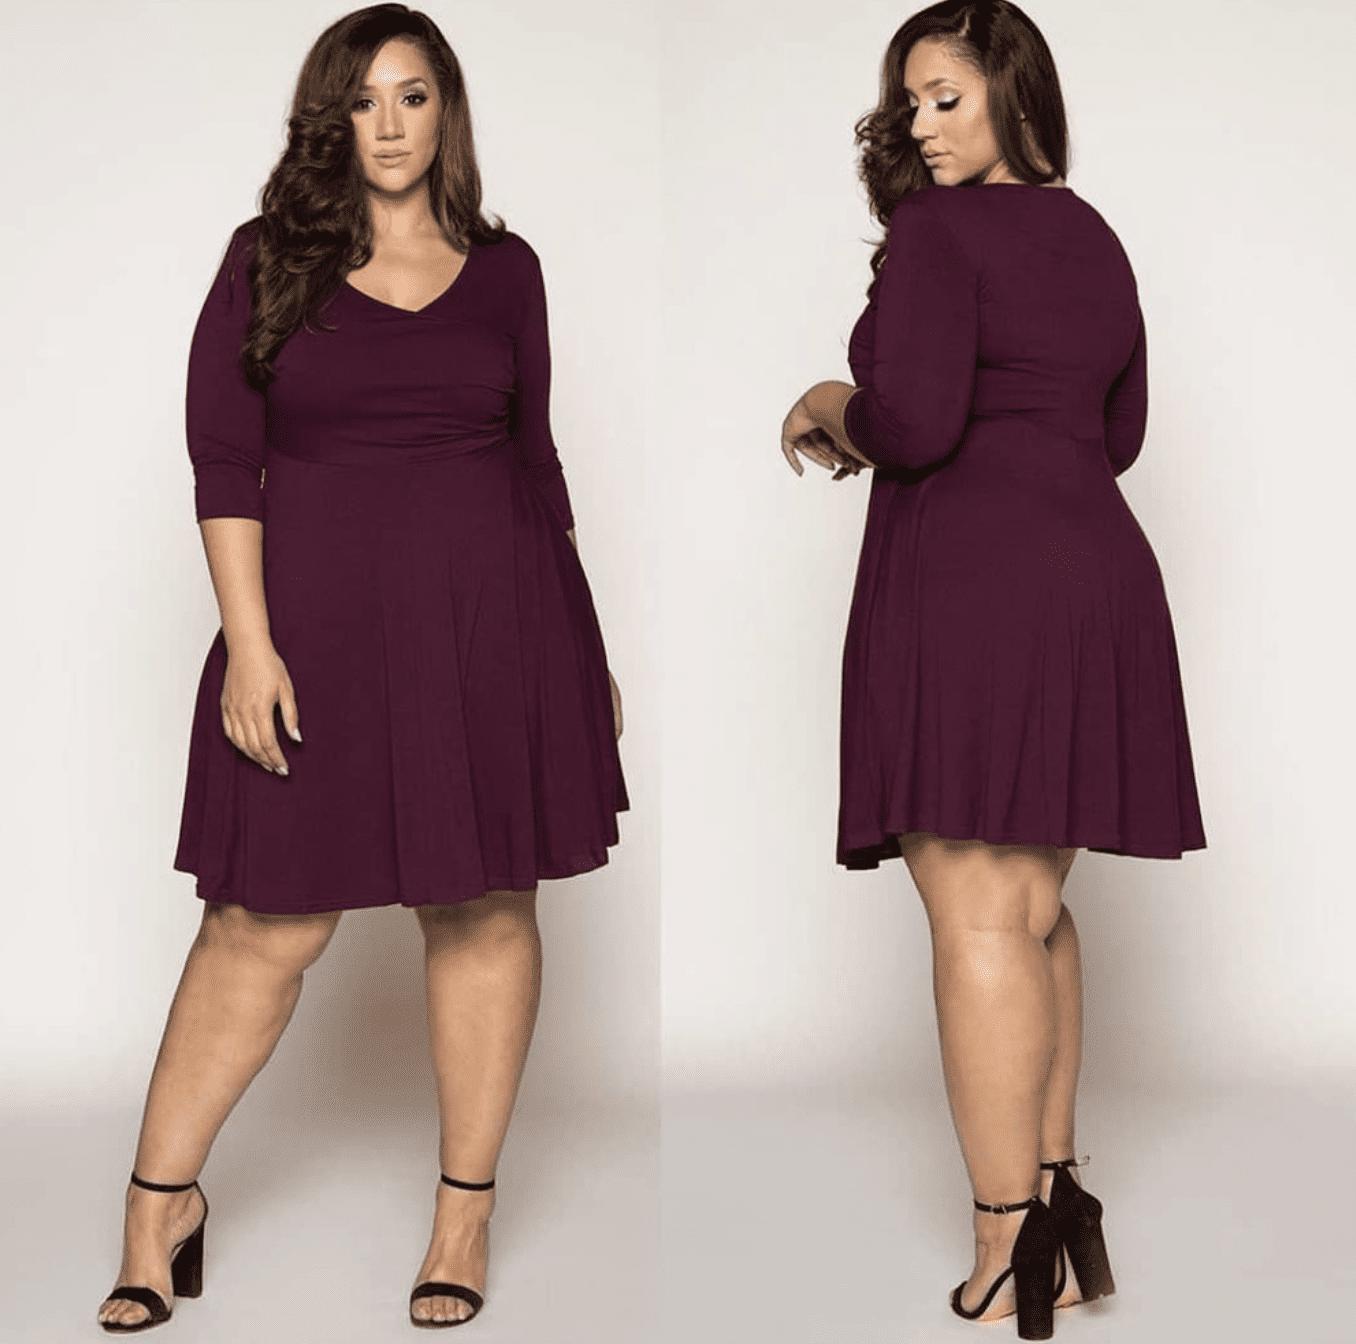 Size-Inclusive Brands Curve Girl Burgundy Dress